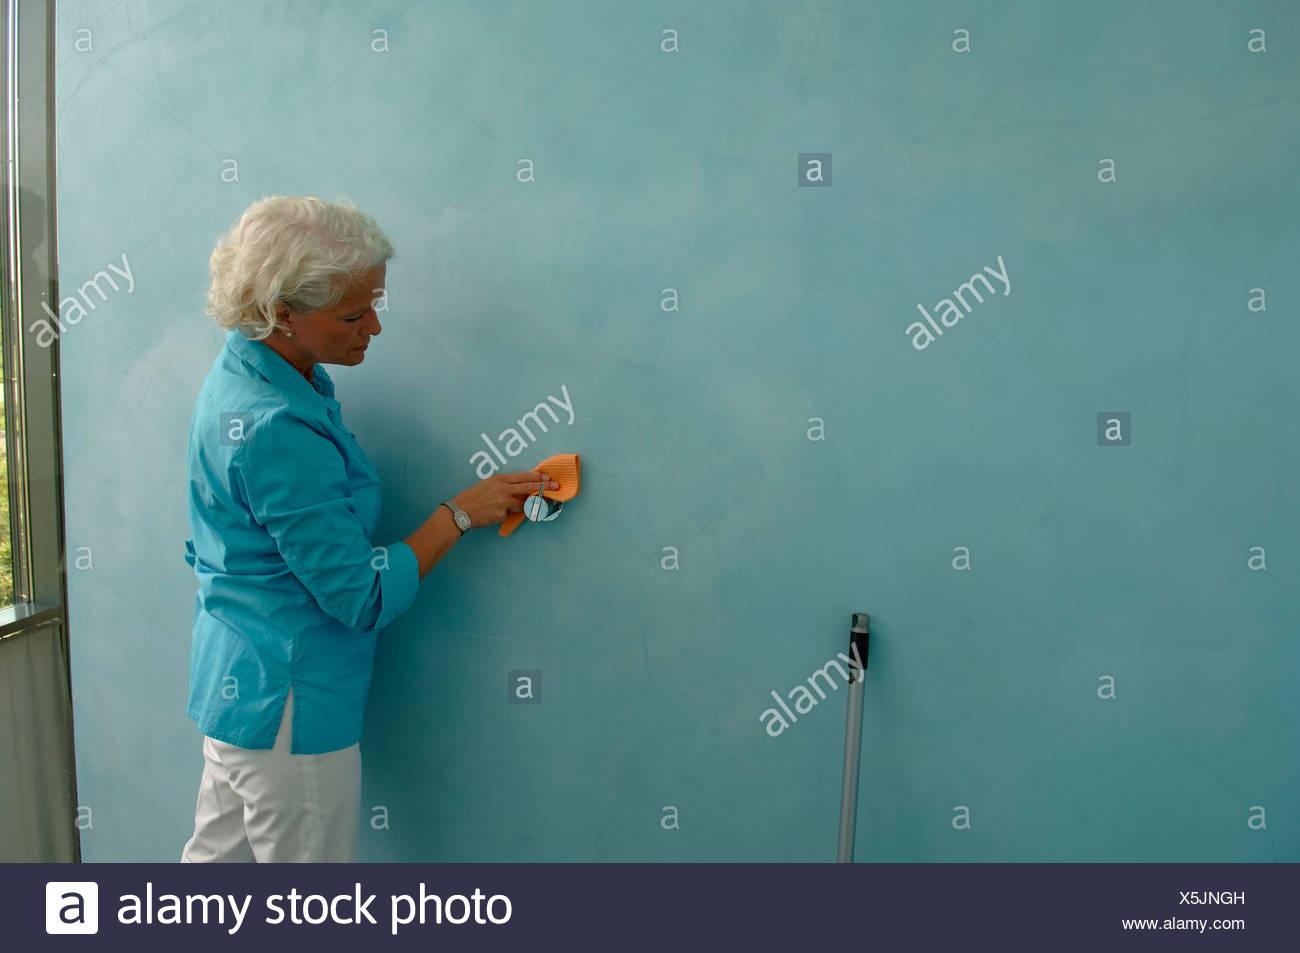 Single Seniors Stock Photos & Single Seniors Stock Images - Alamy